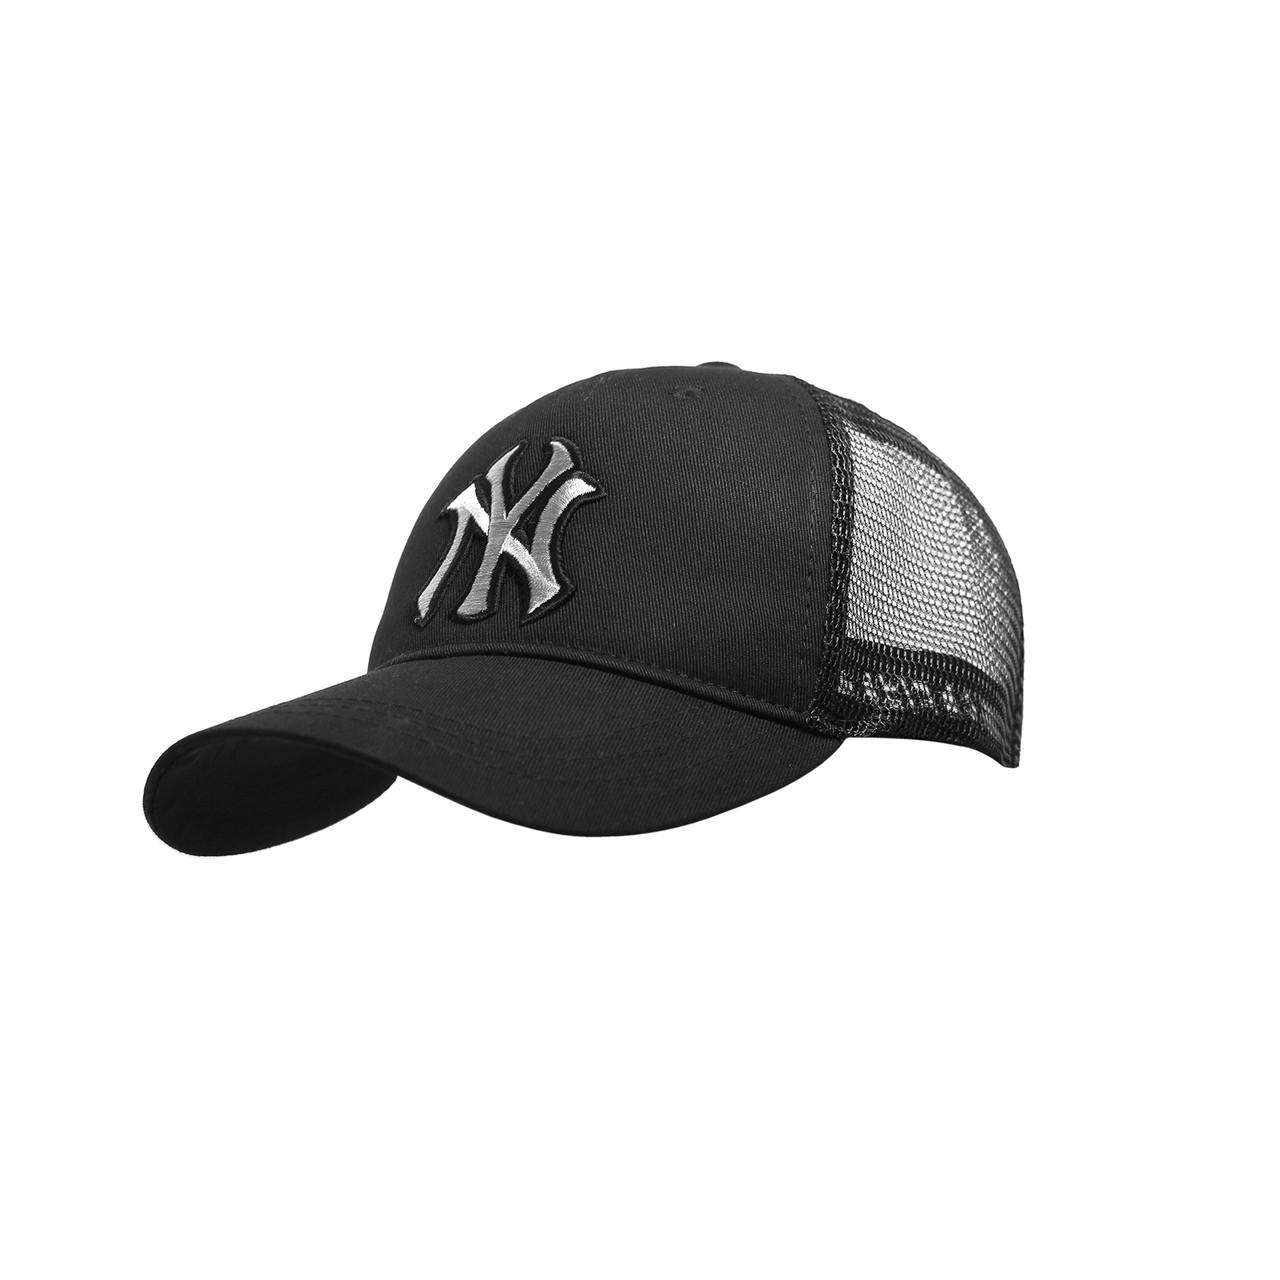 Бейсболка Трекерка  Мужская white белая с логотипом надпись Бейсболки New York Yankees